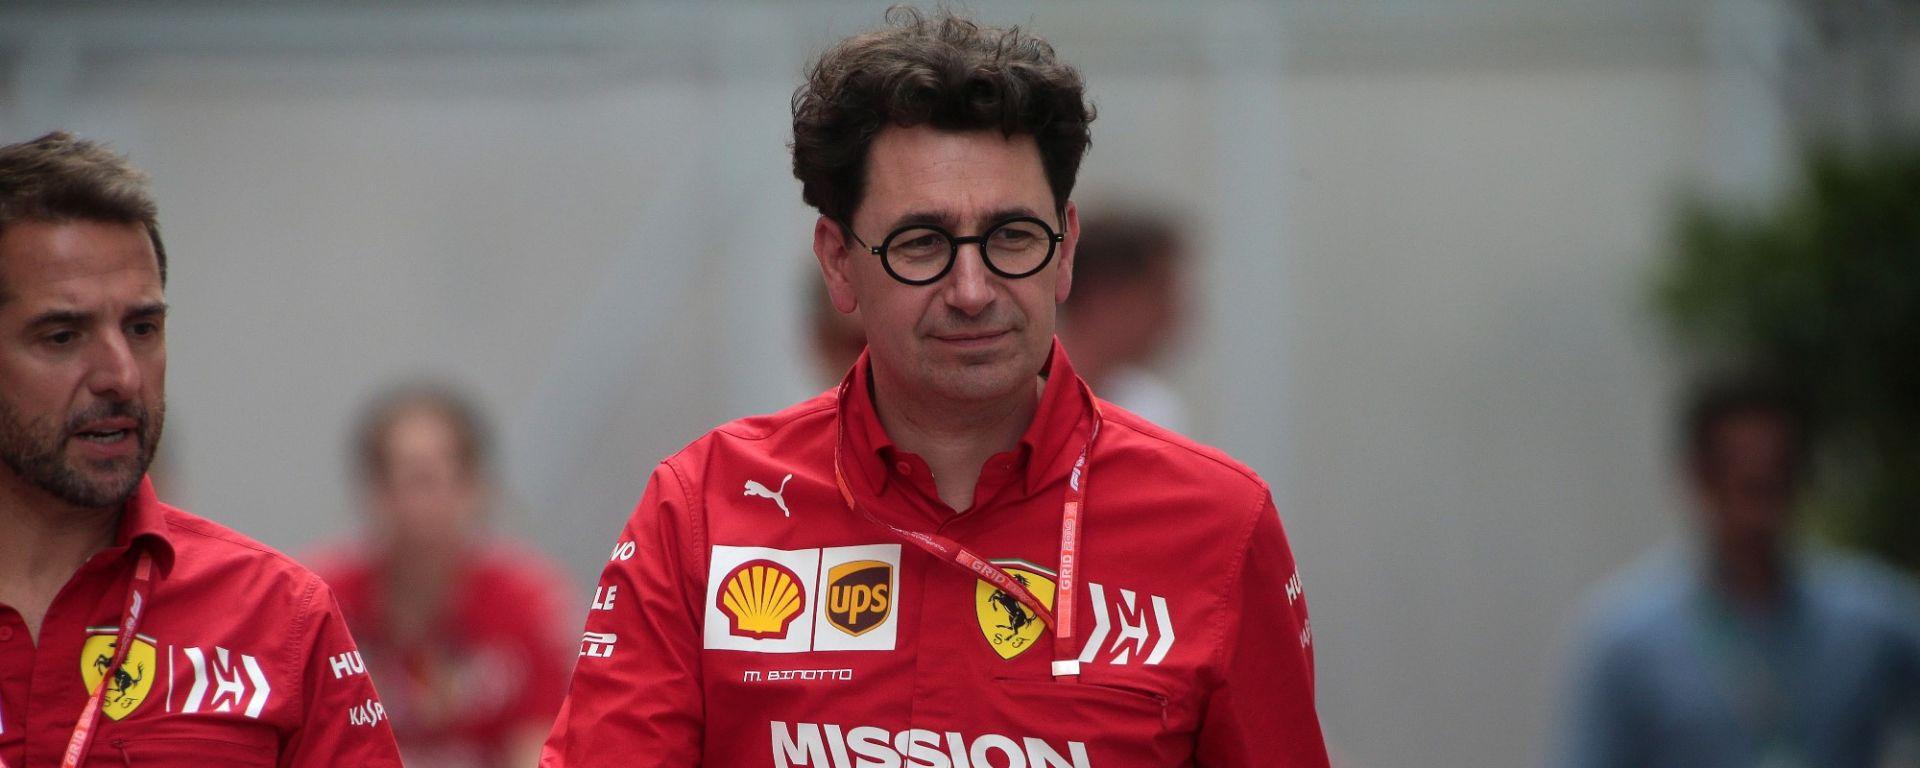 GP Monaco 2019, Mattia Binotto (Ferrari)